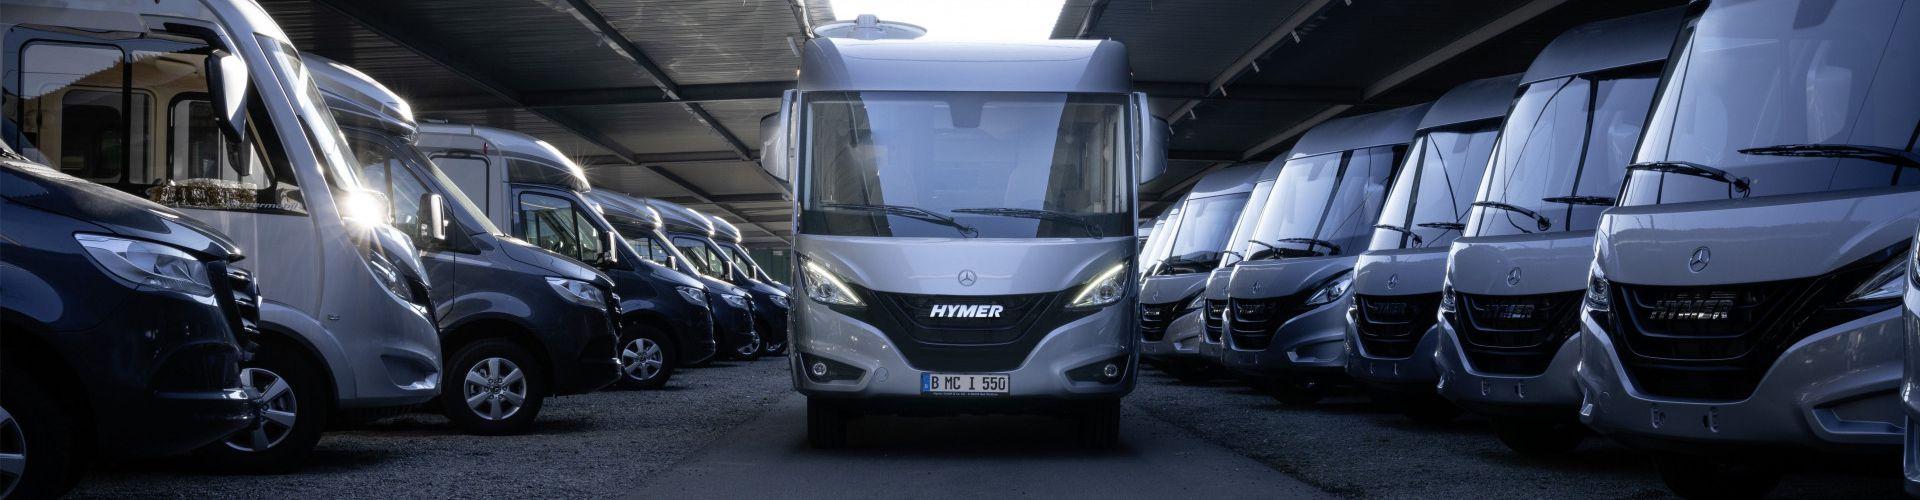 Hymer Magyarország